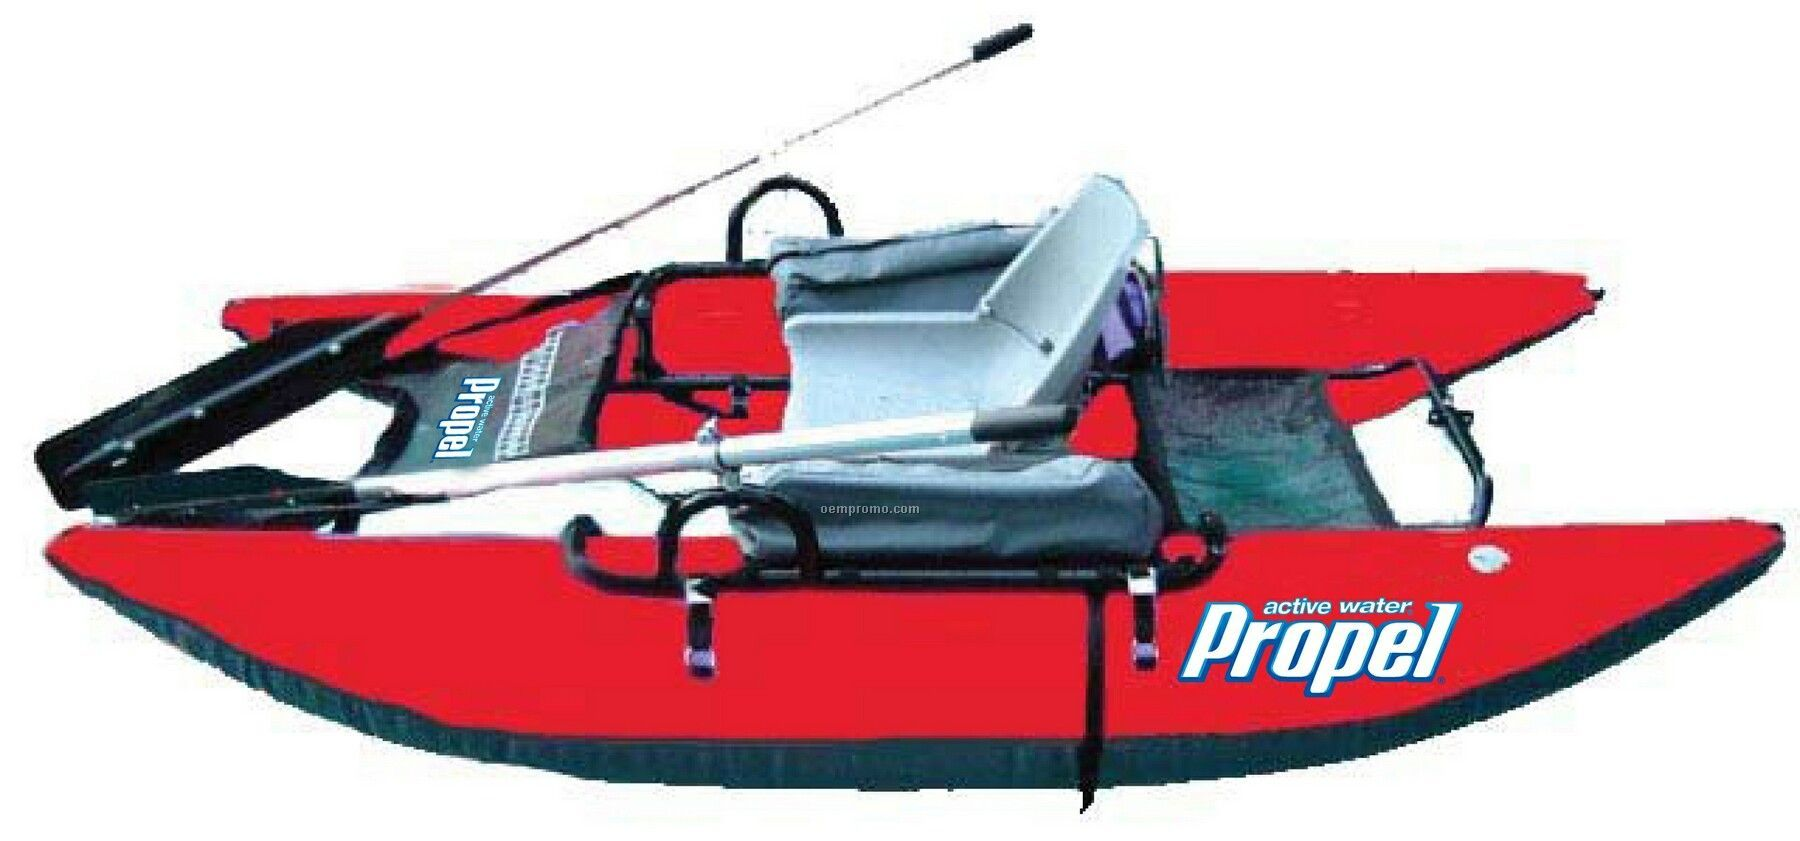 Pontoon Fishing Boat